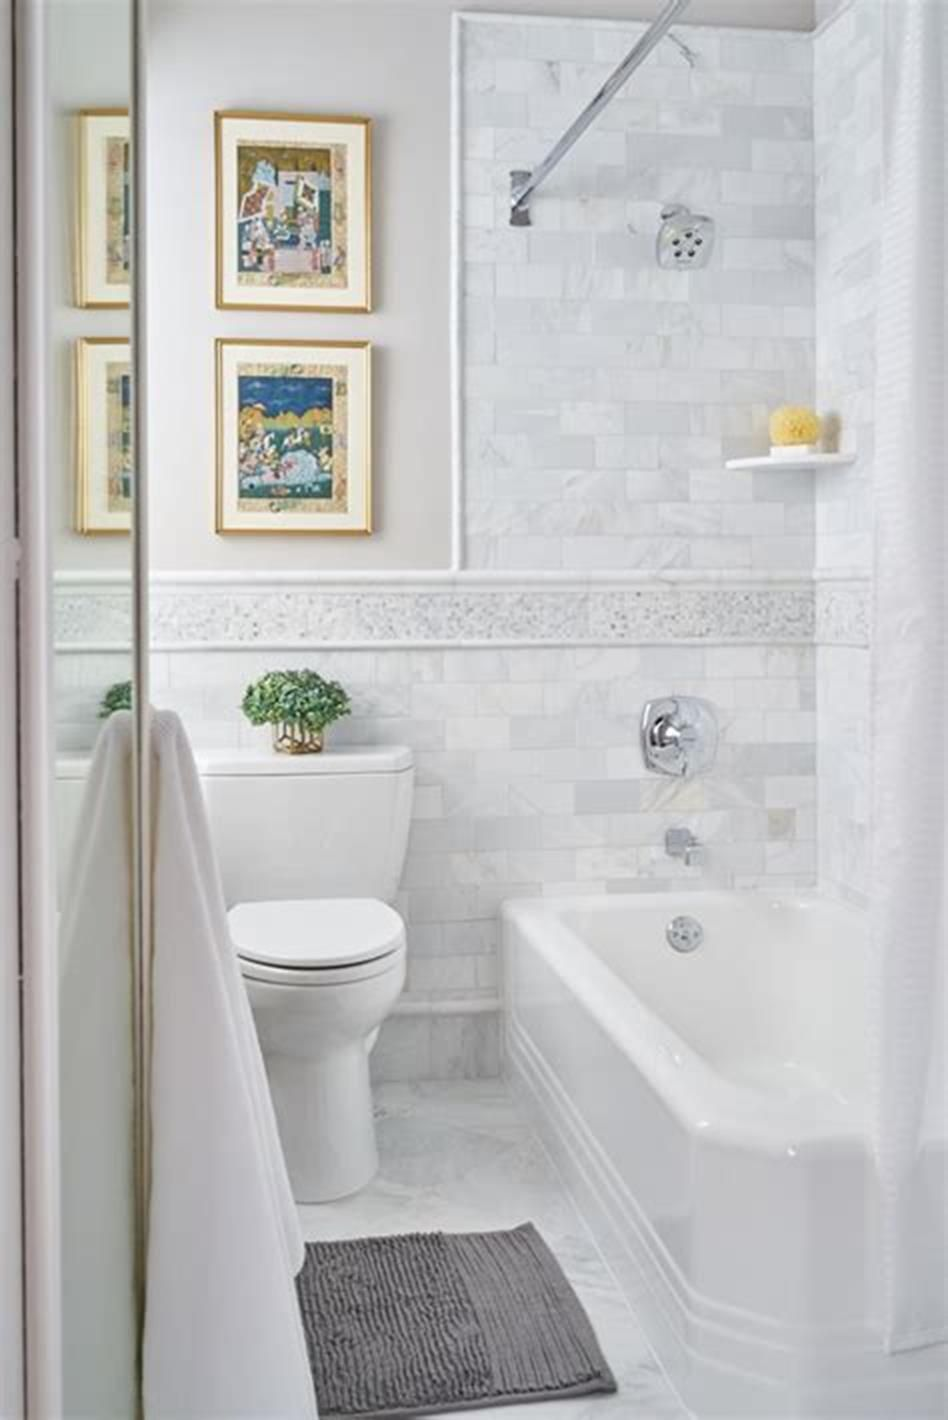 49 stunning half bath design and decor ideas small space on stunning small bathroom design ideas id=31368